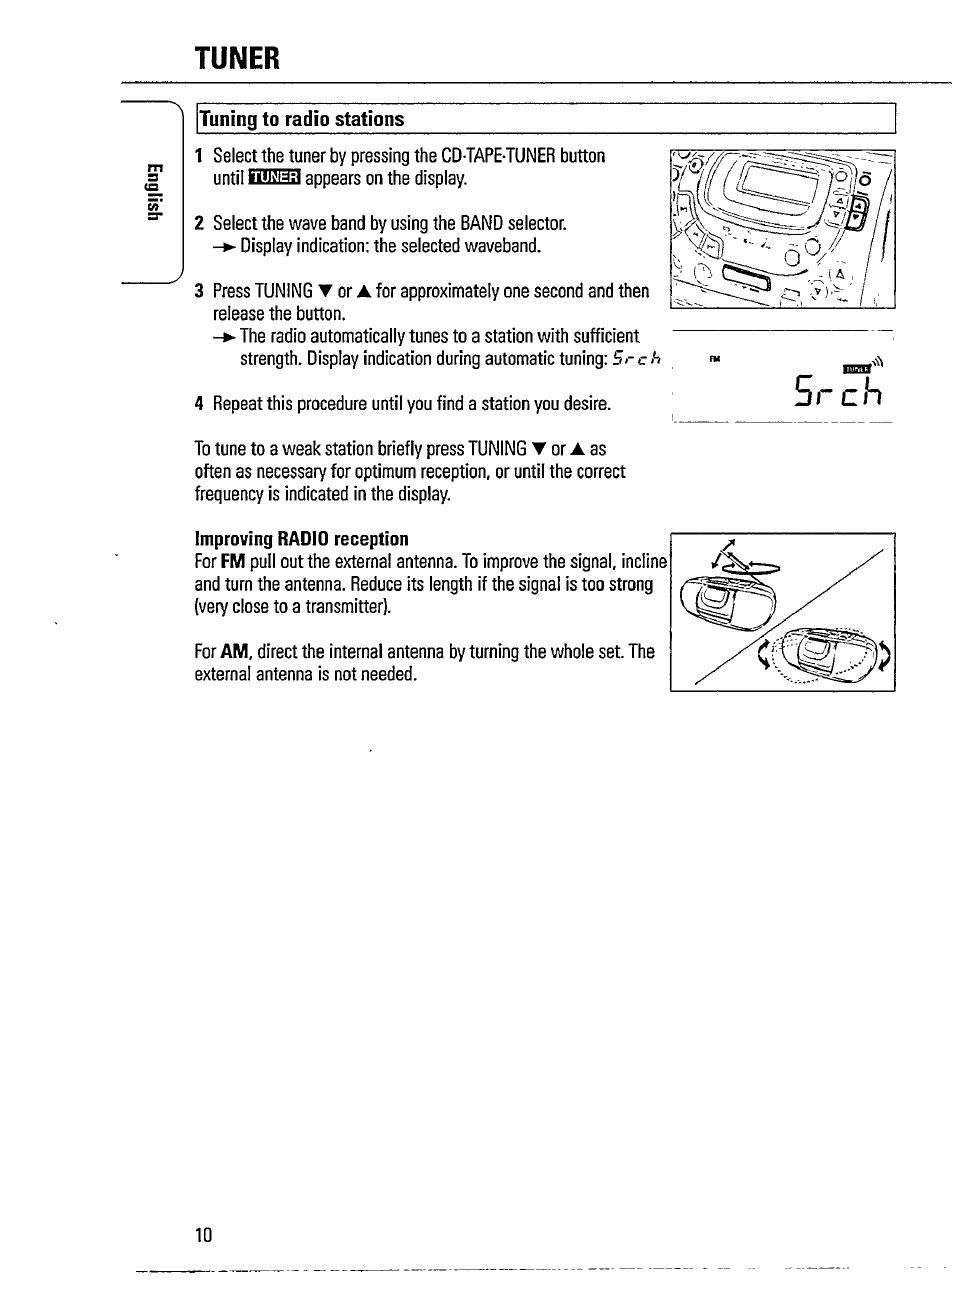 tuner tuning to radio stations sssi philips magnavox az1518 user rh manualsdir com Philips Electronics Manuals Philips Flat TV Manual